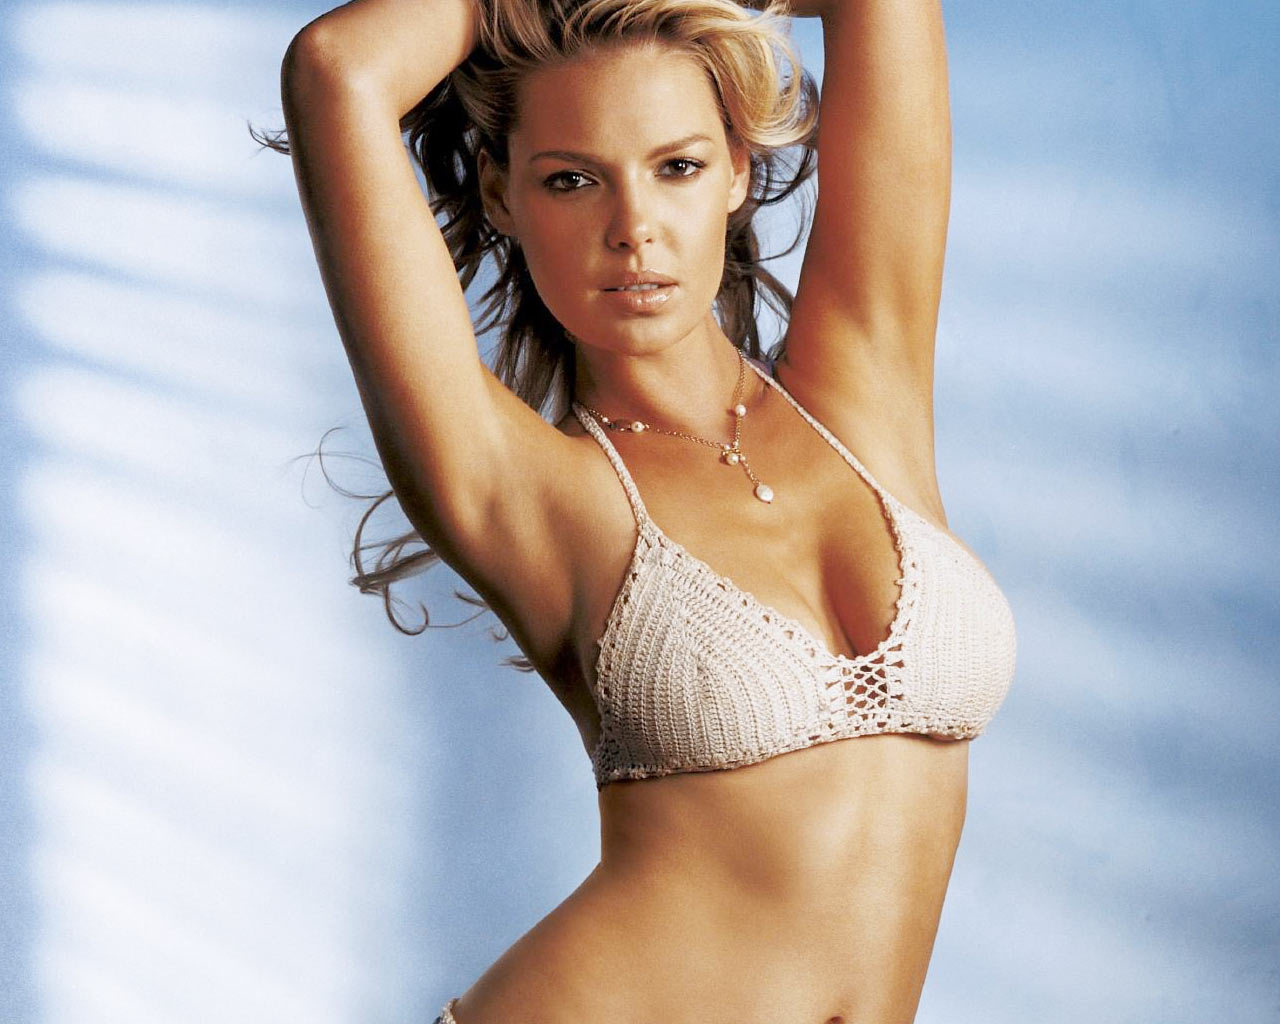 http://2.bp.blogspot.com/-JSvdO7diwaY/TyV5pZox0fI/AAAAAAAAB8g/sKcN5dFDUM0/s1600/katherine-heigl-looking-sexy-55479.jpg